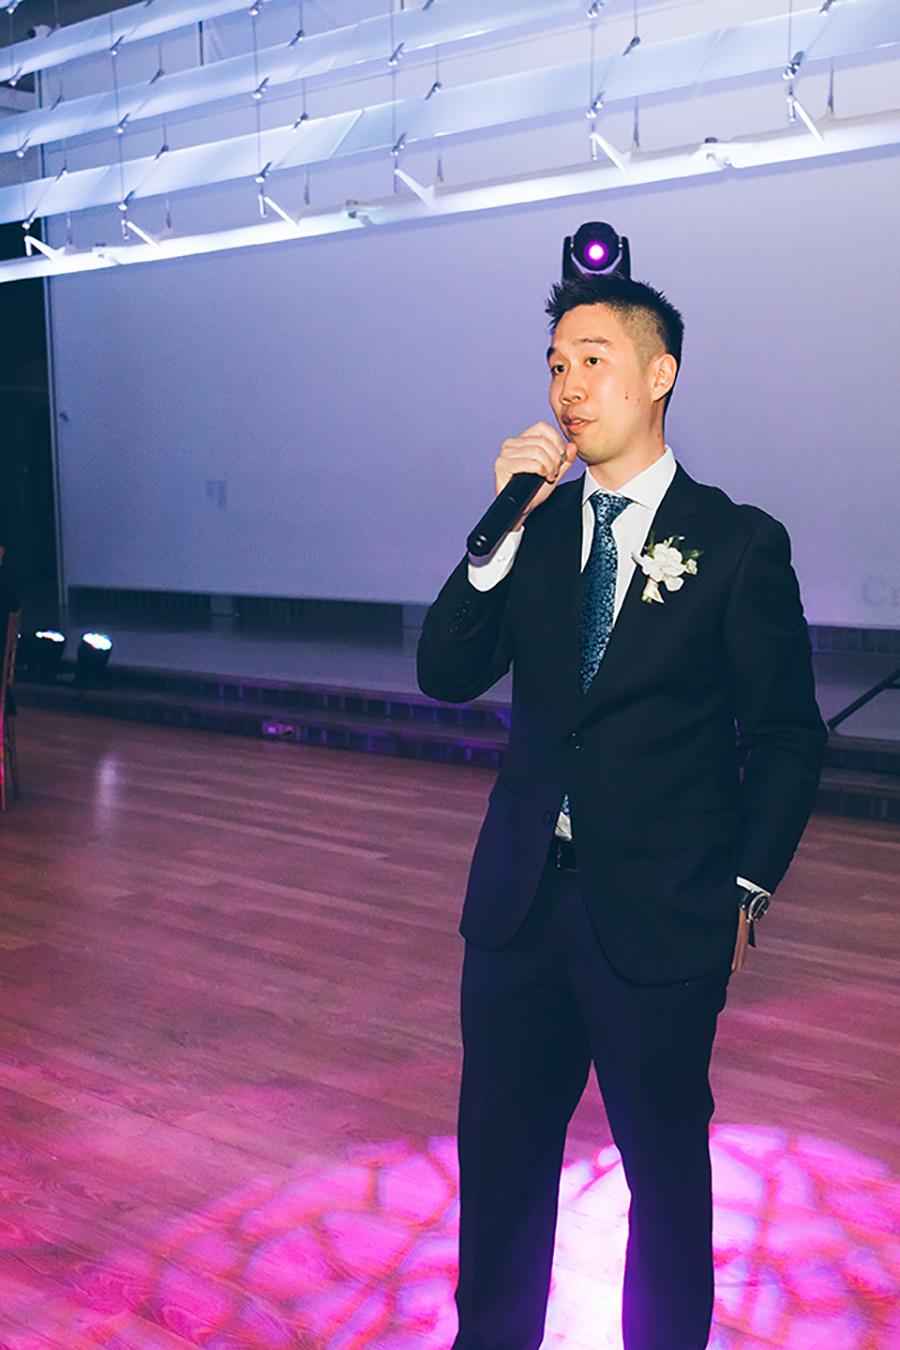 JUDITH-IRVING-NYC-WEDDING-RECEPTION-CYNTHIACHUNG-0259.jpg